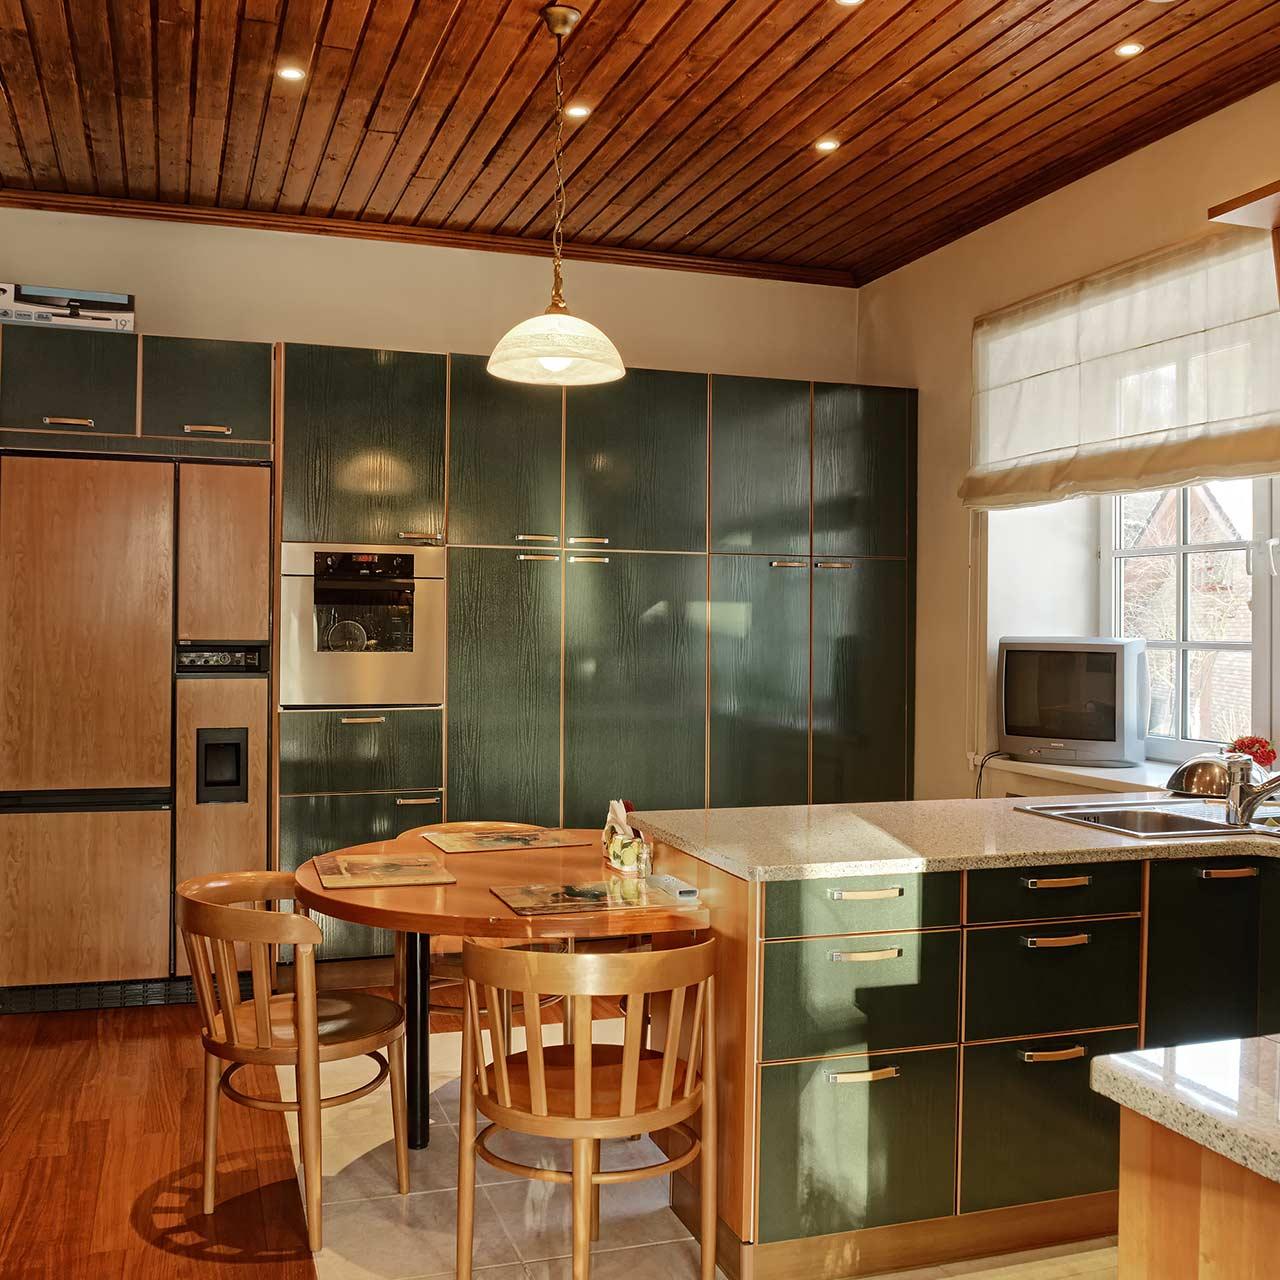 American Modular Kitchen Design